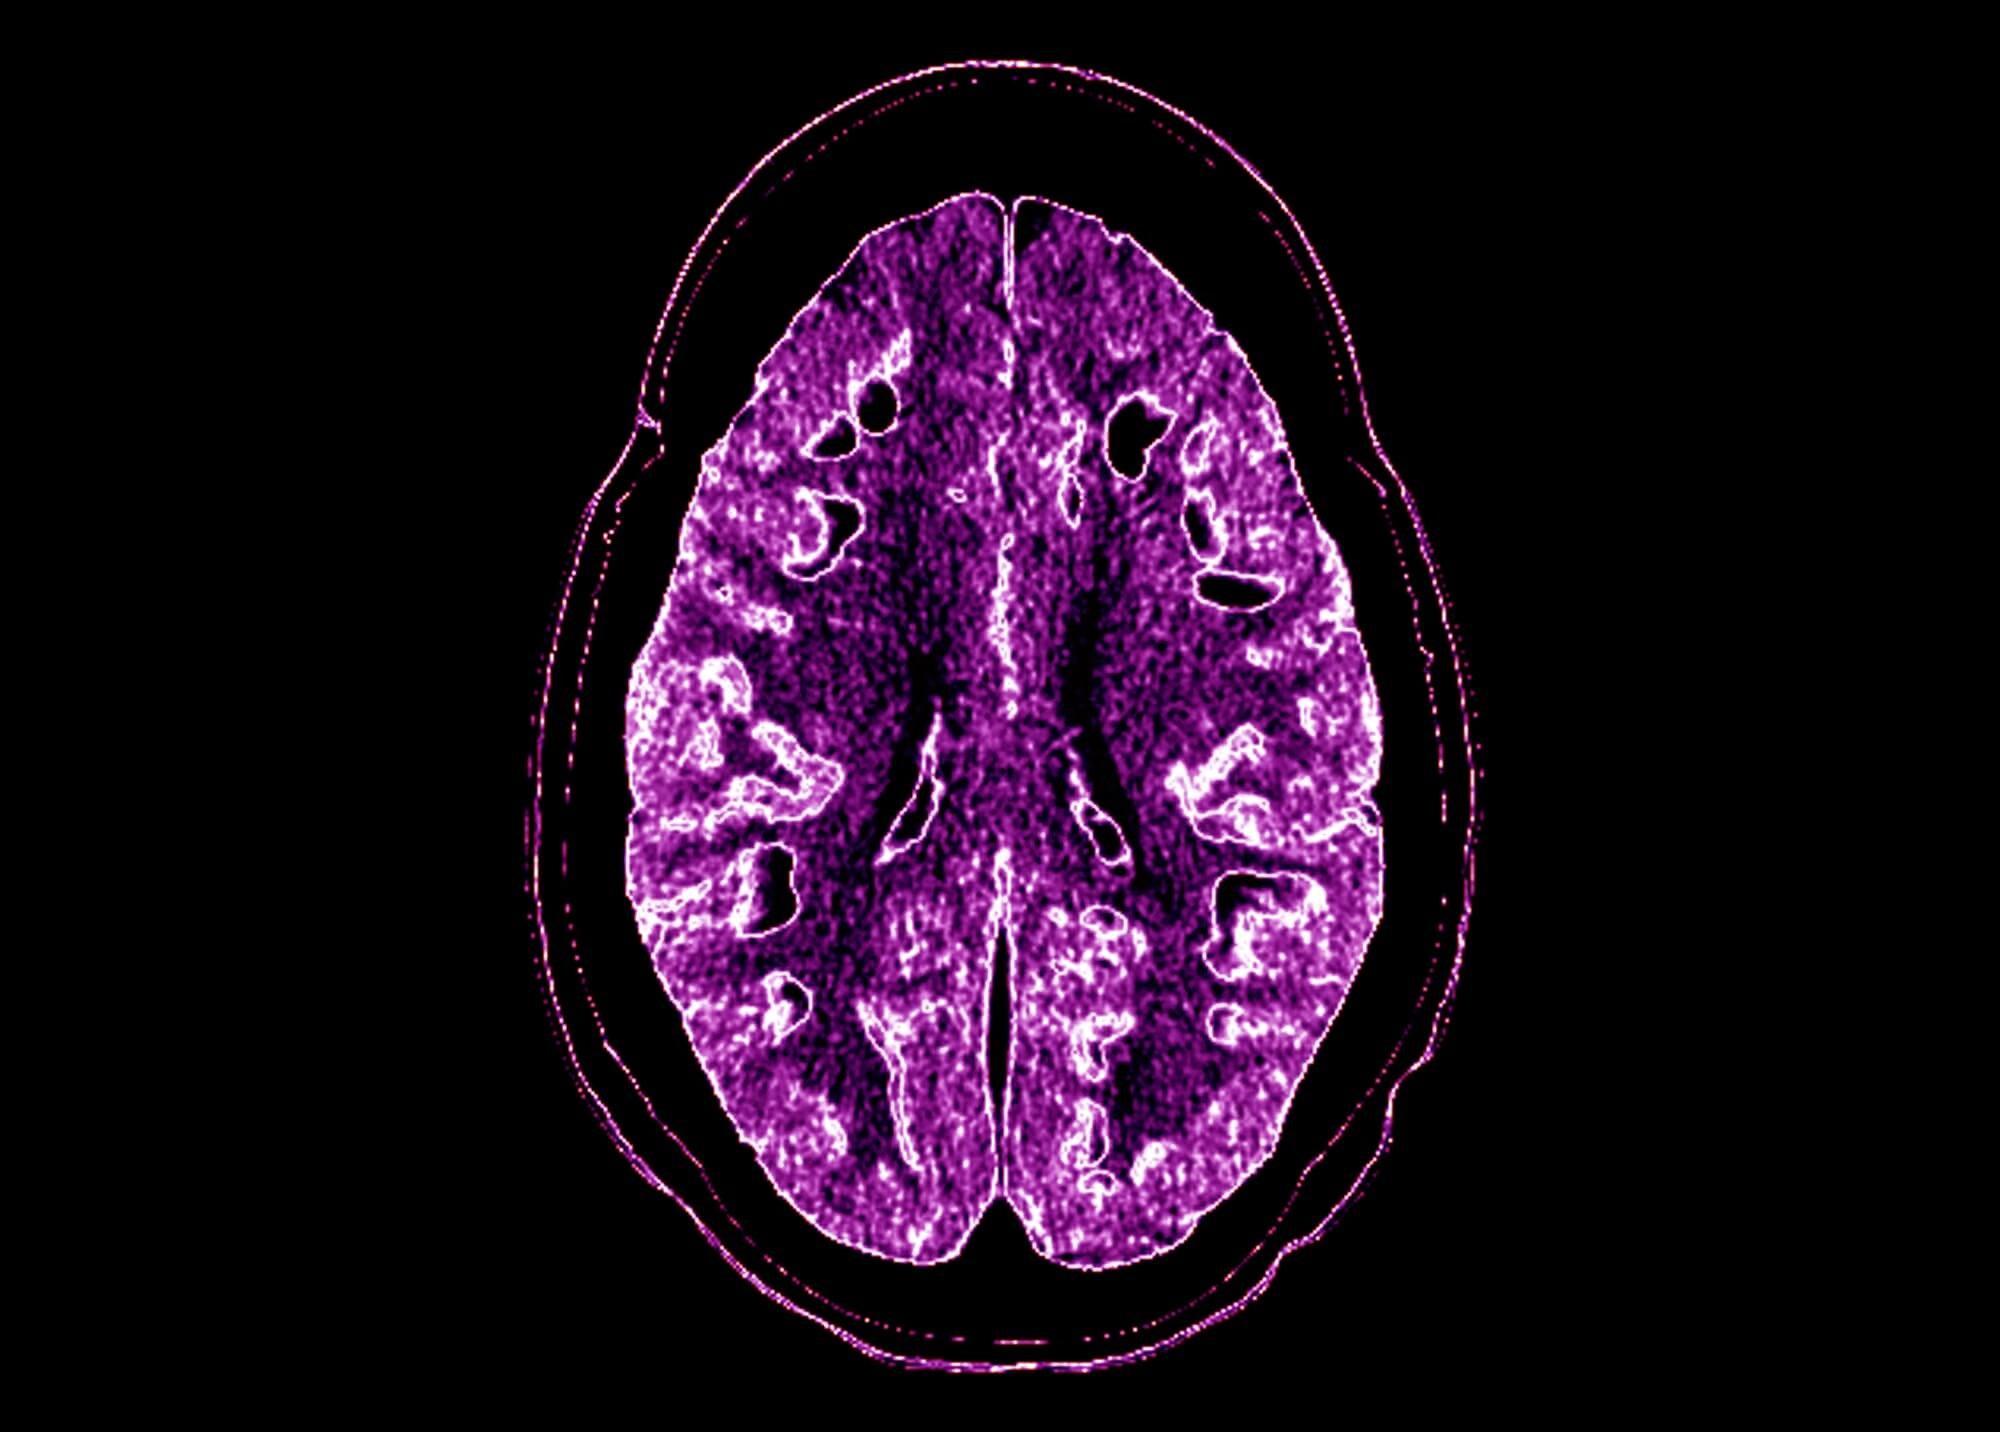 Symptoms of RVCL mimic those of tumefactive multiple sclerosis. <i>Credit:Living Art Enterprises/Science Source</i>